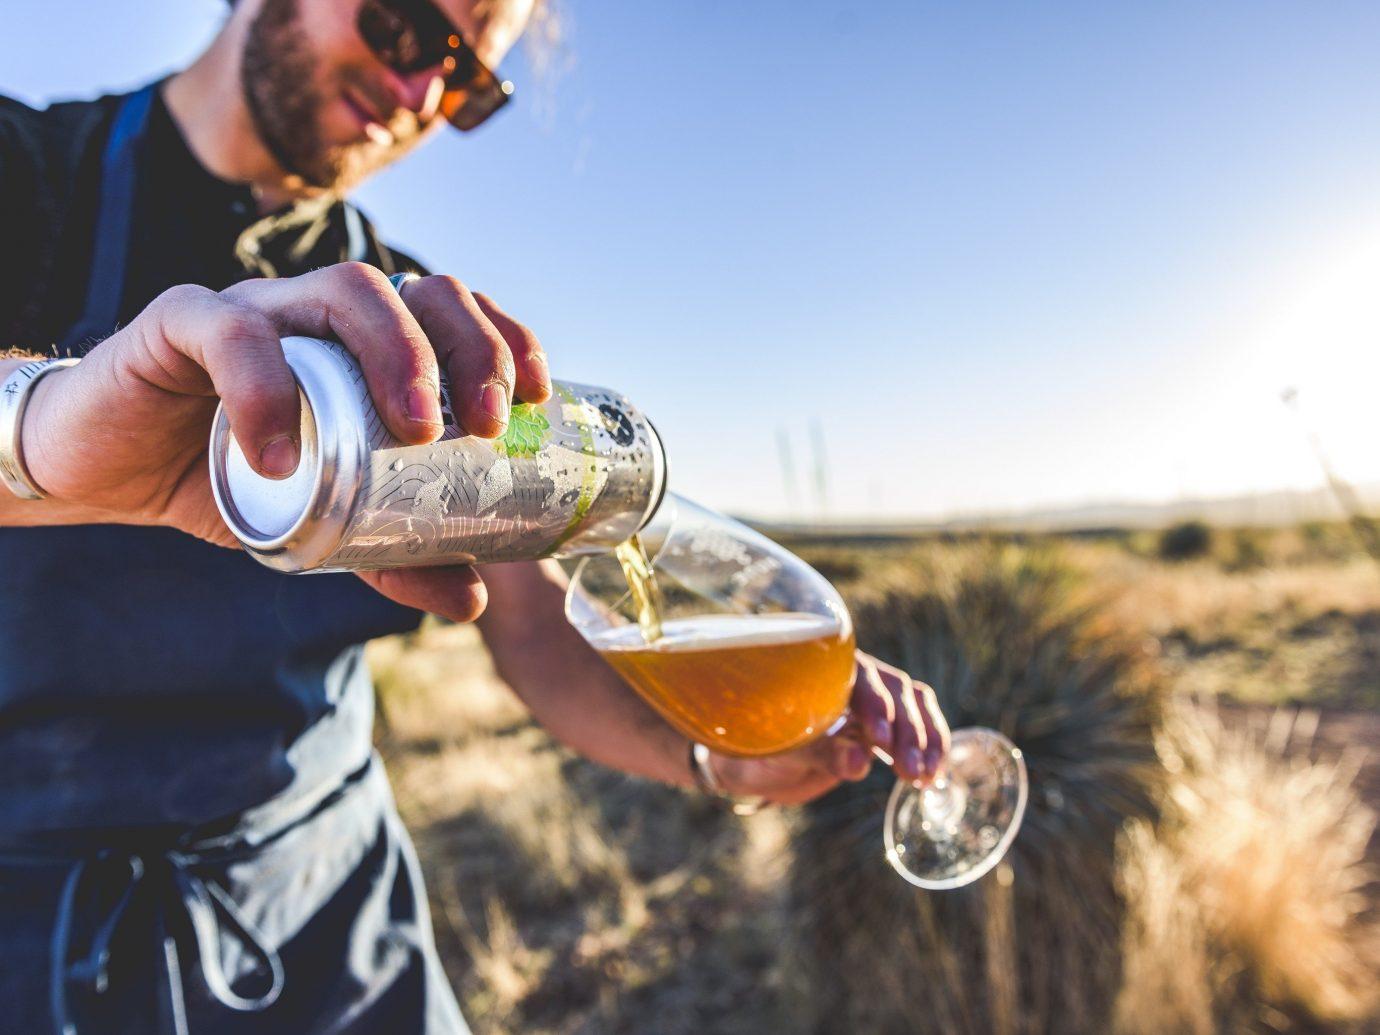 Health + Wellness Meditation Retreats Trip Ideas Yoga Retreats sky person outdoor water Drink sense food drinking